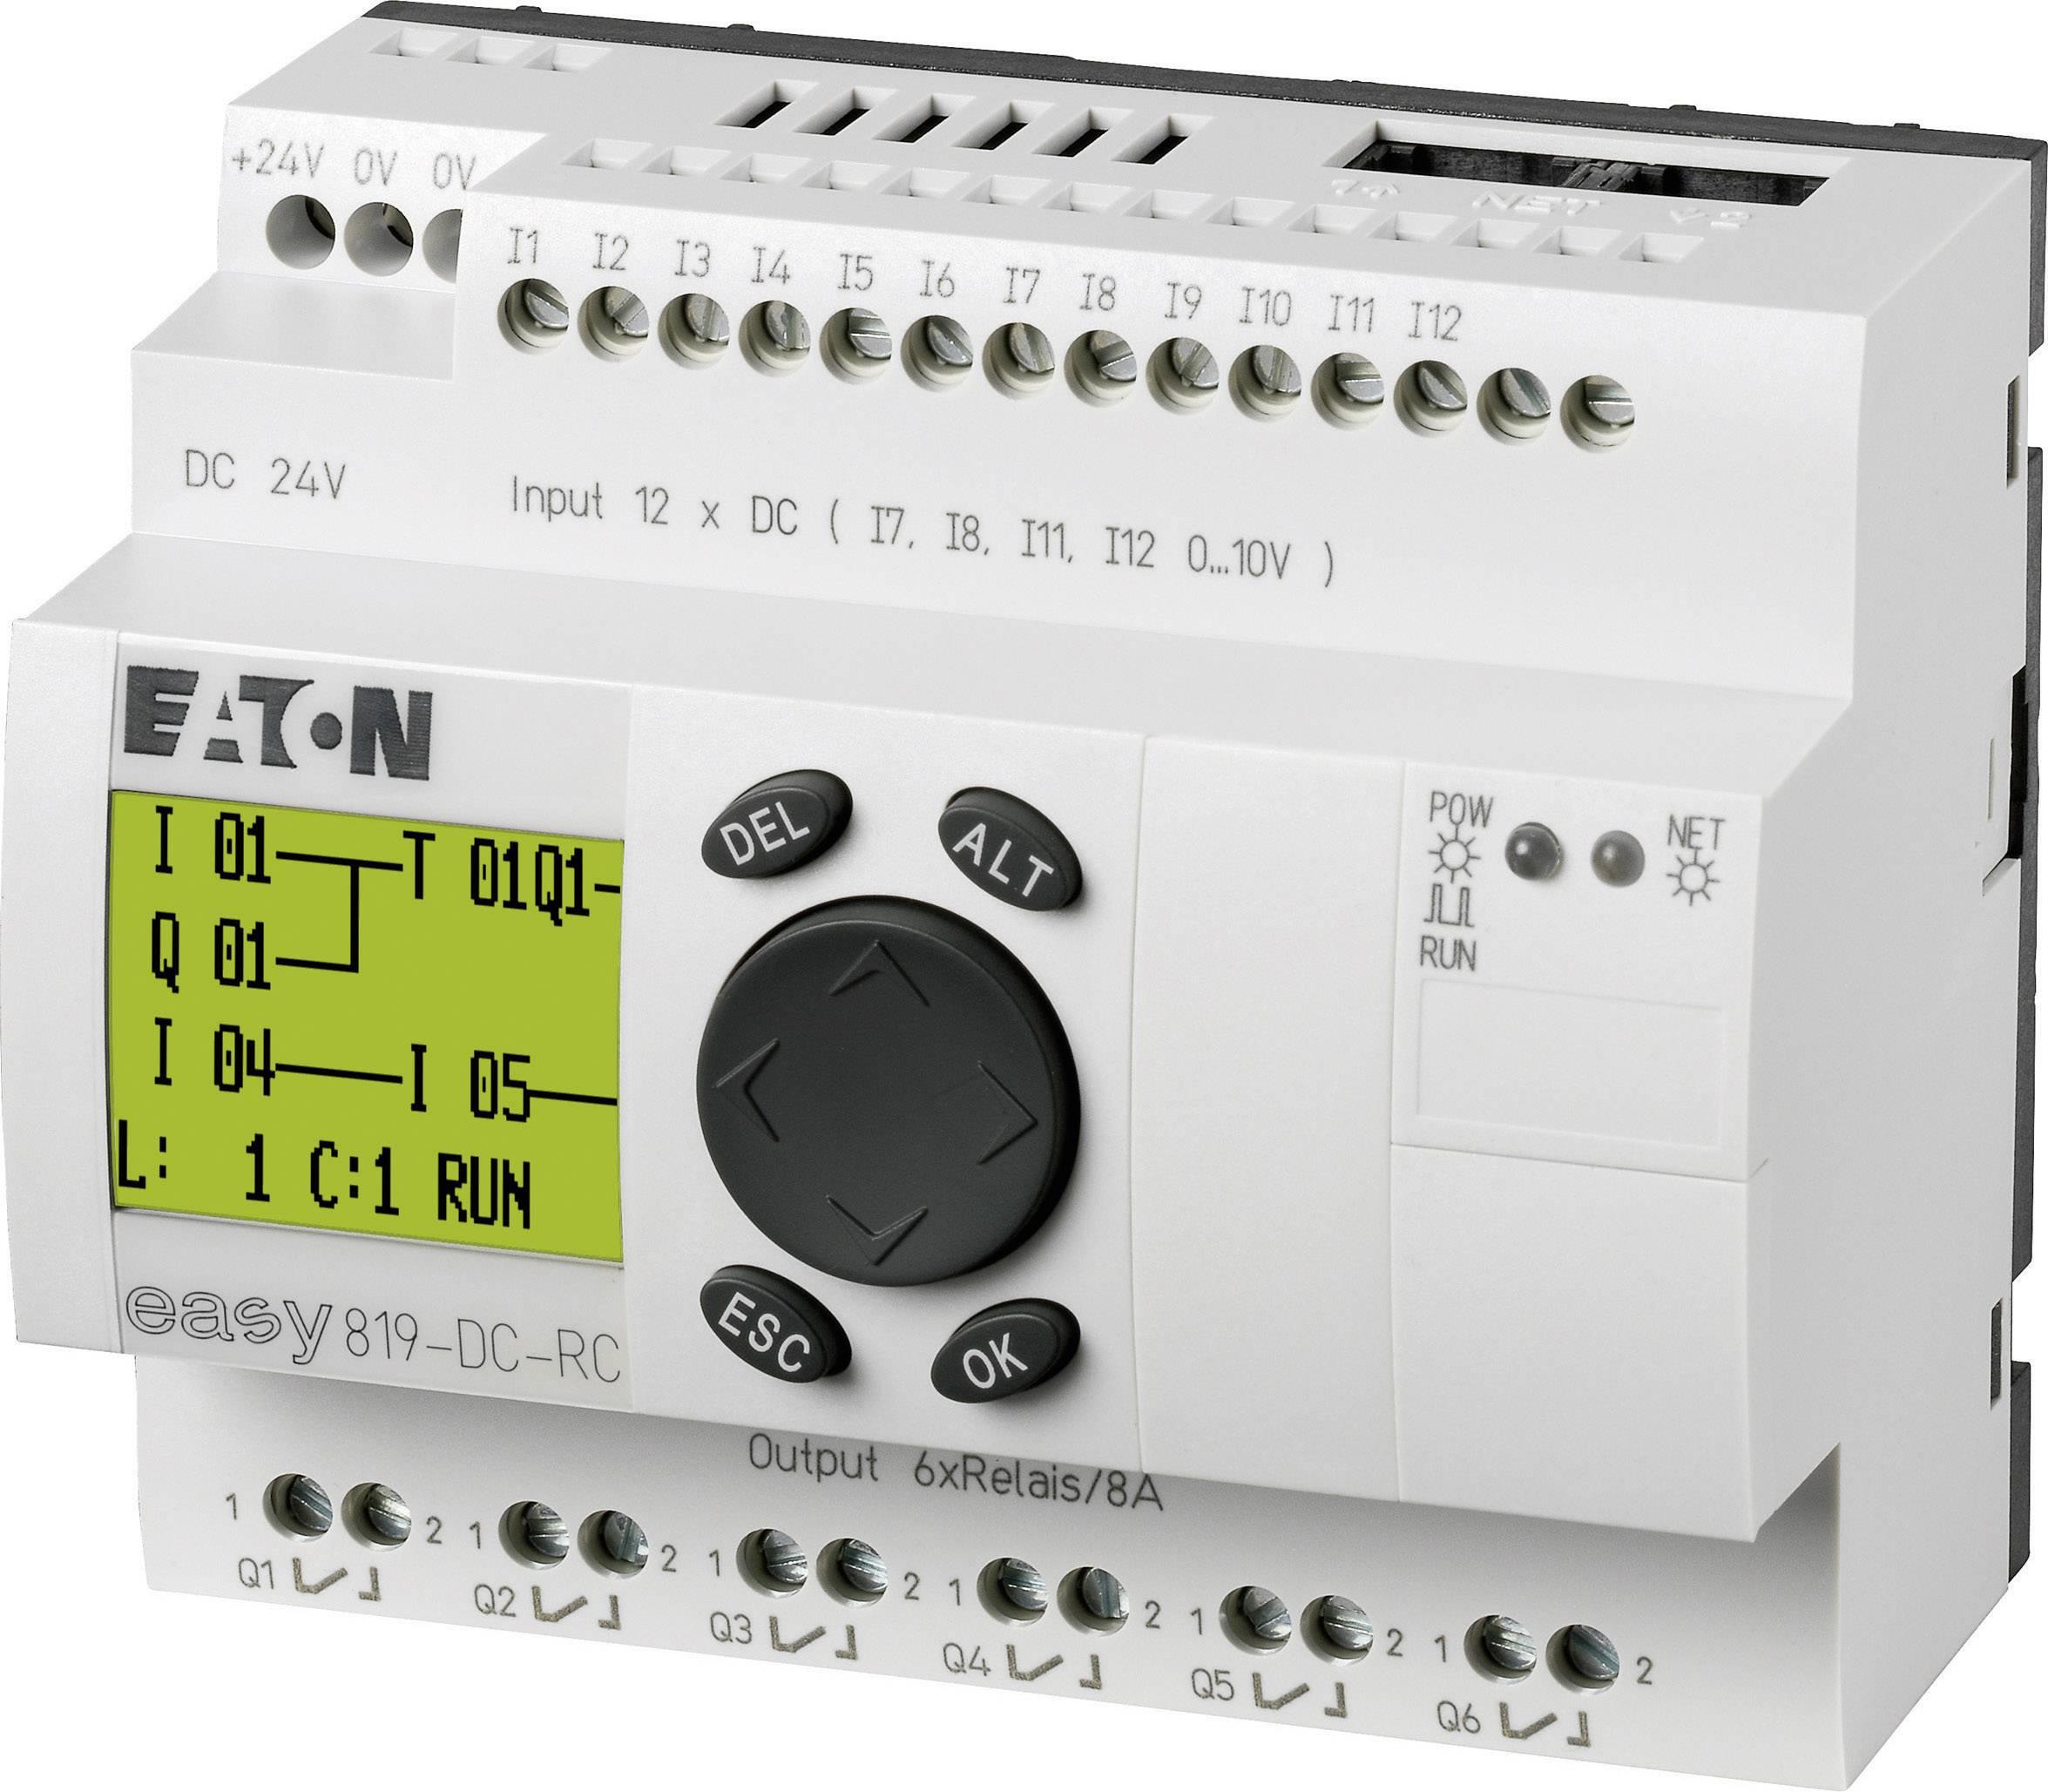 Řídicí reléový modul Eaton easy 819-DC-RC (256269), IP20, 12, 6x relé